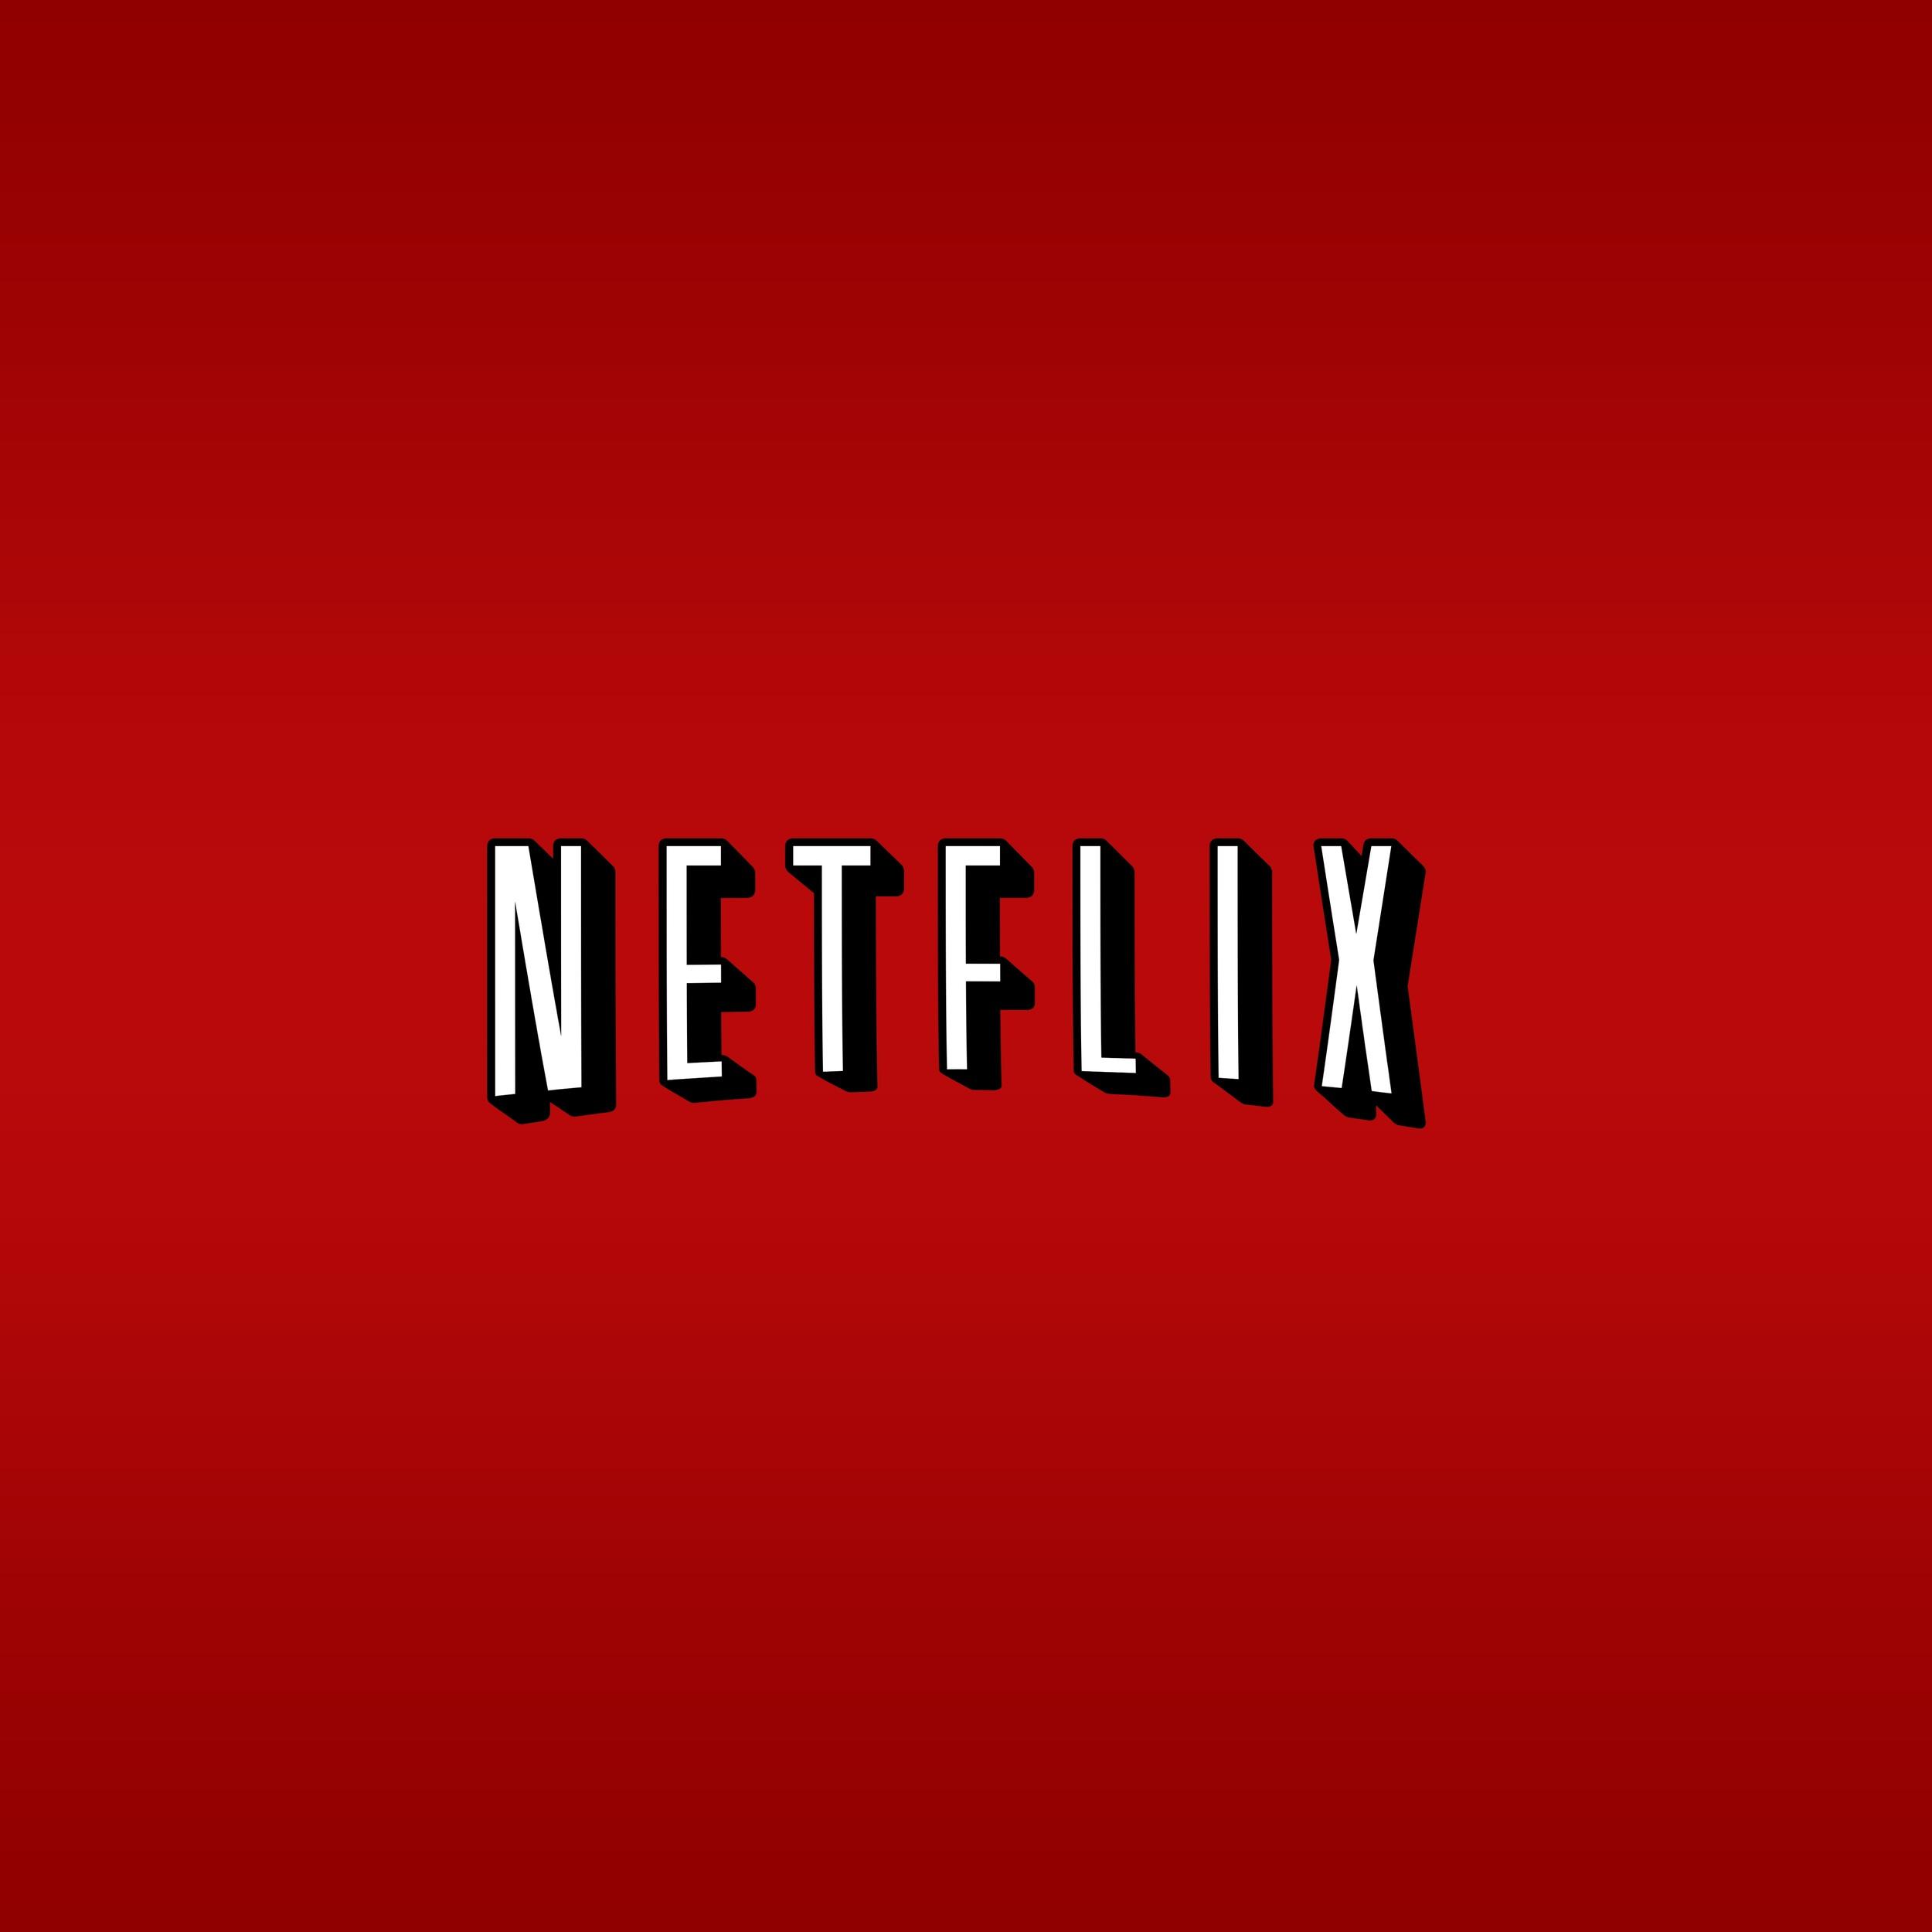 Netflix-Logo.jpg